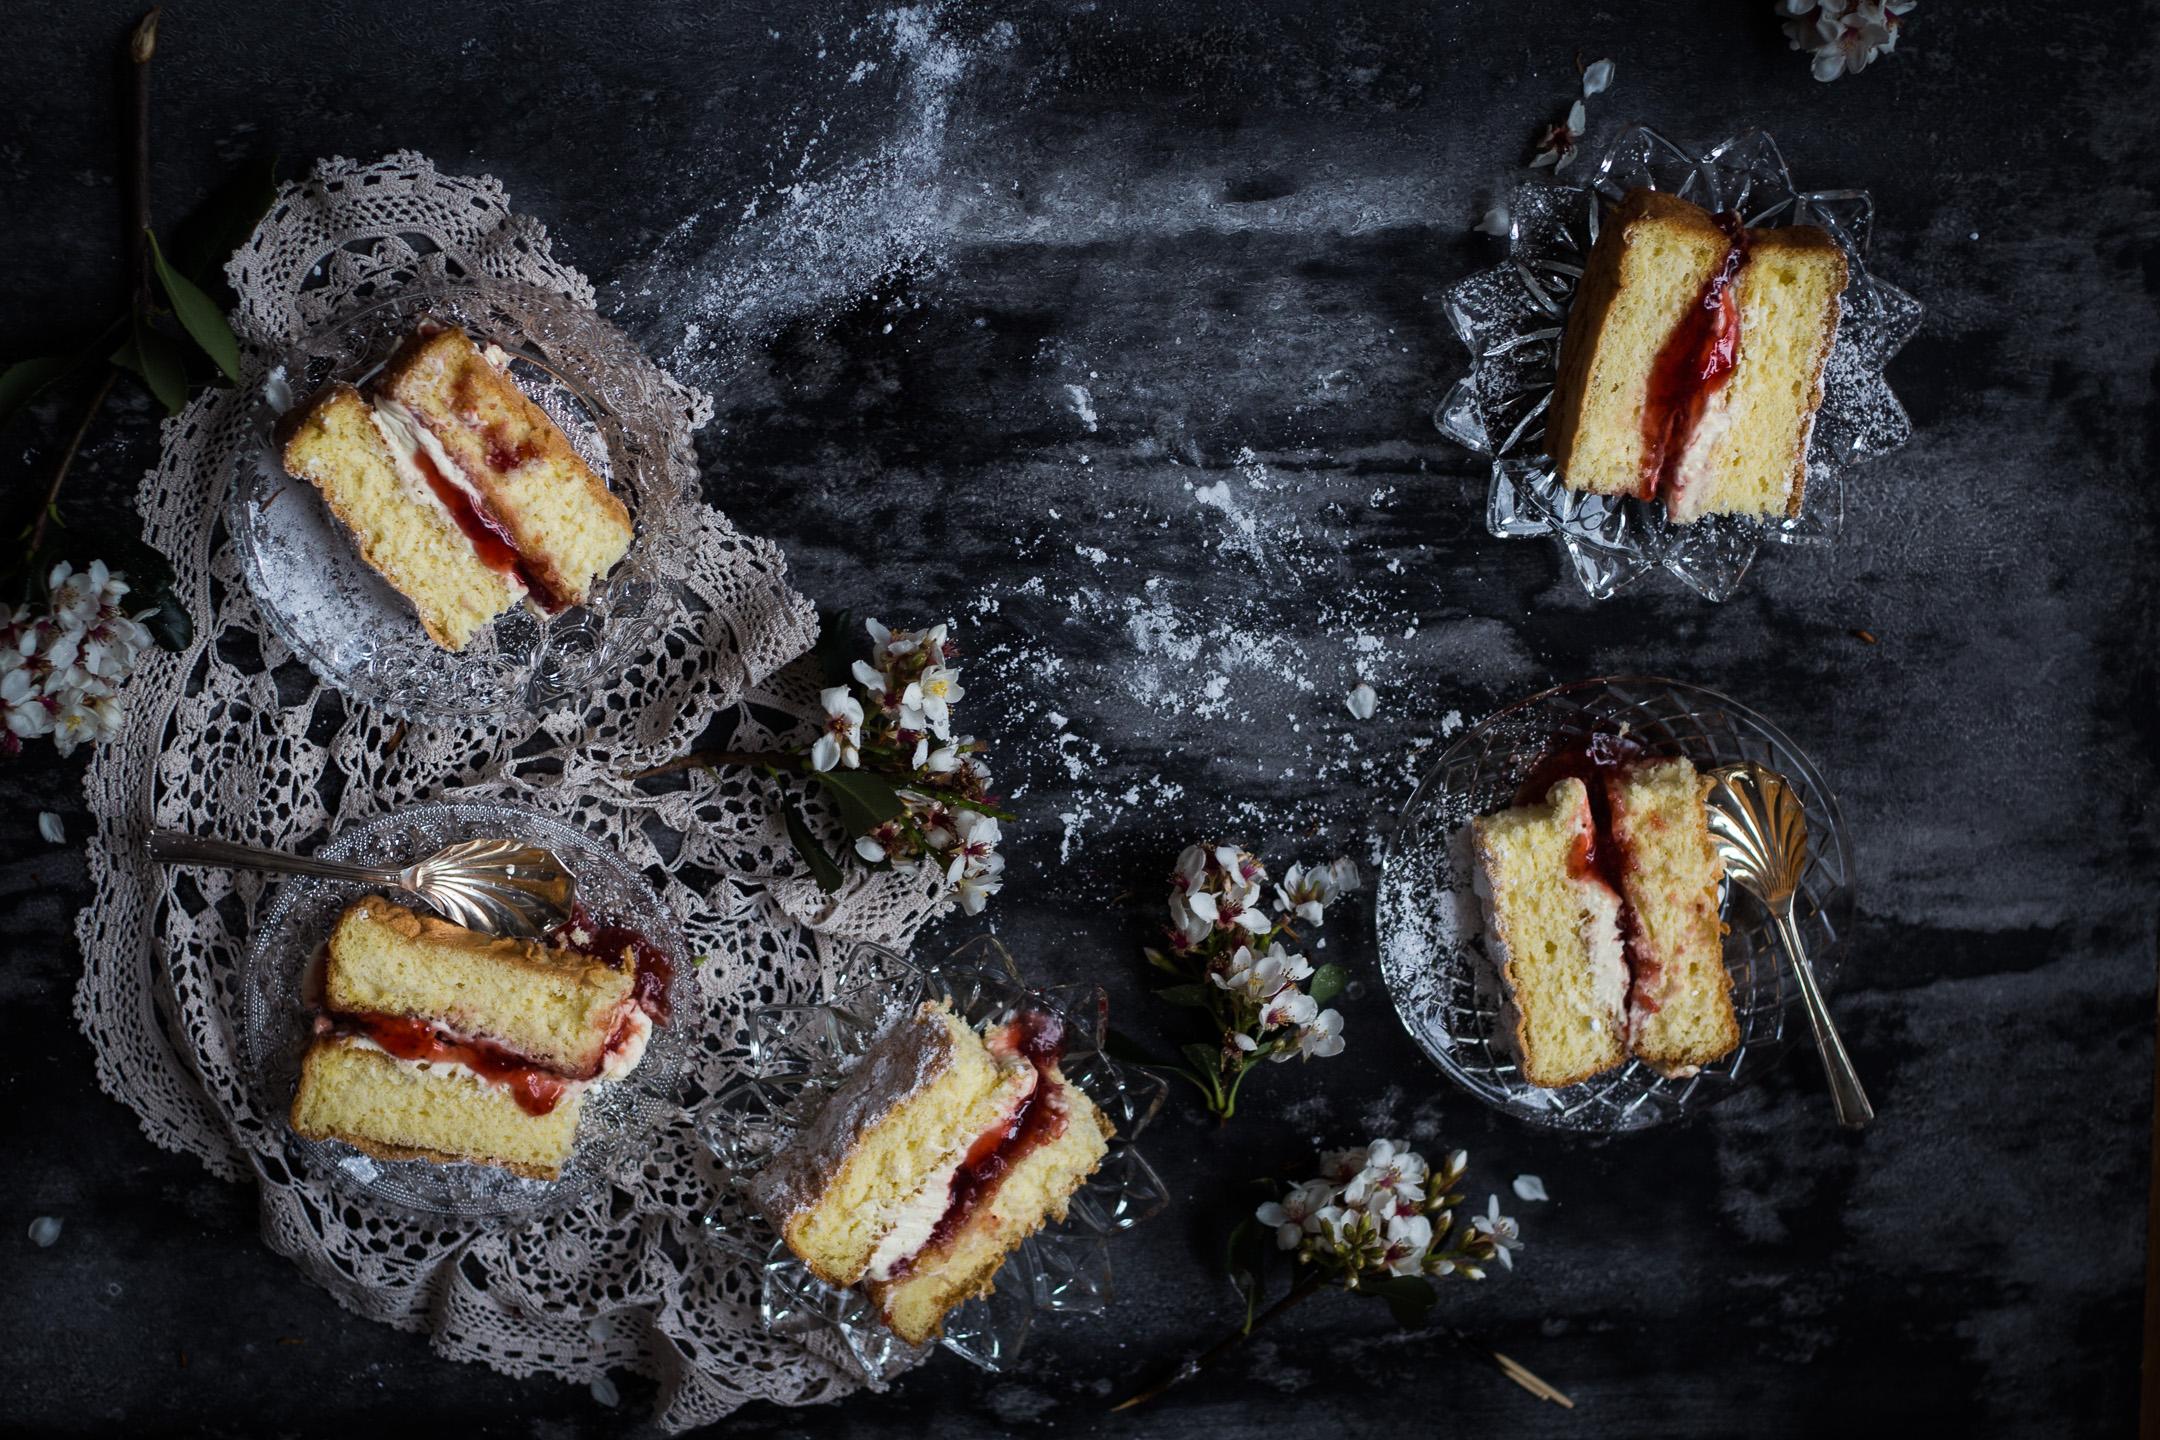 victorian-sponge-cake-gluten-free-recipe-8